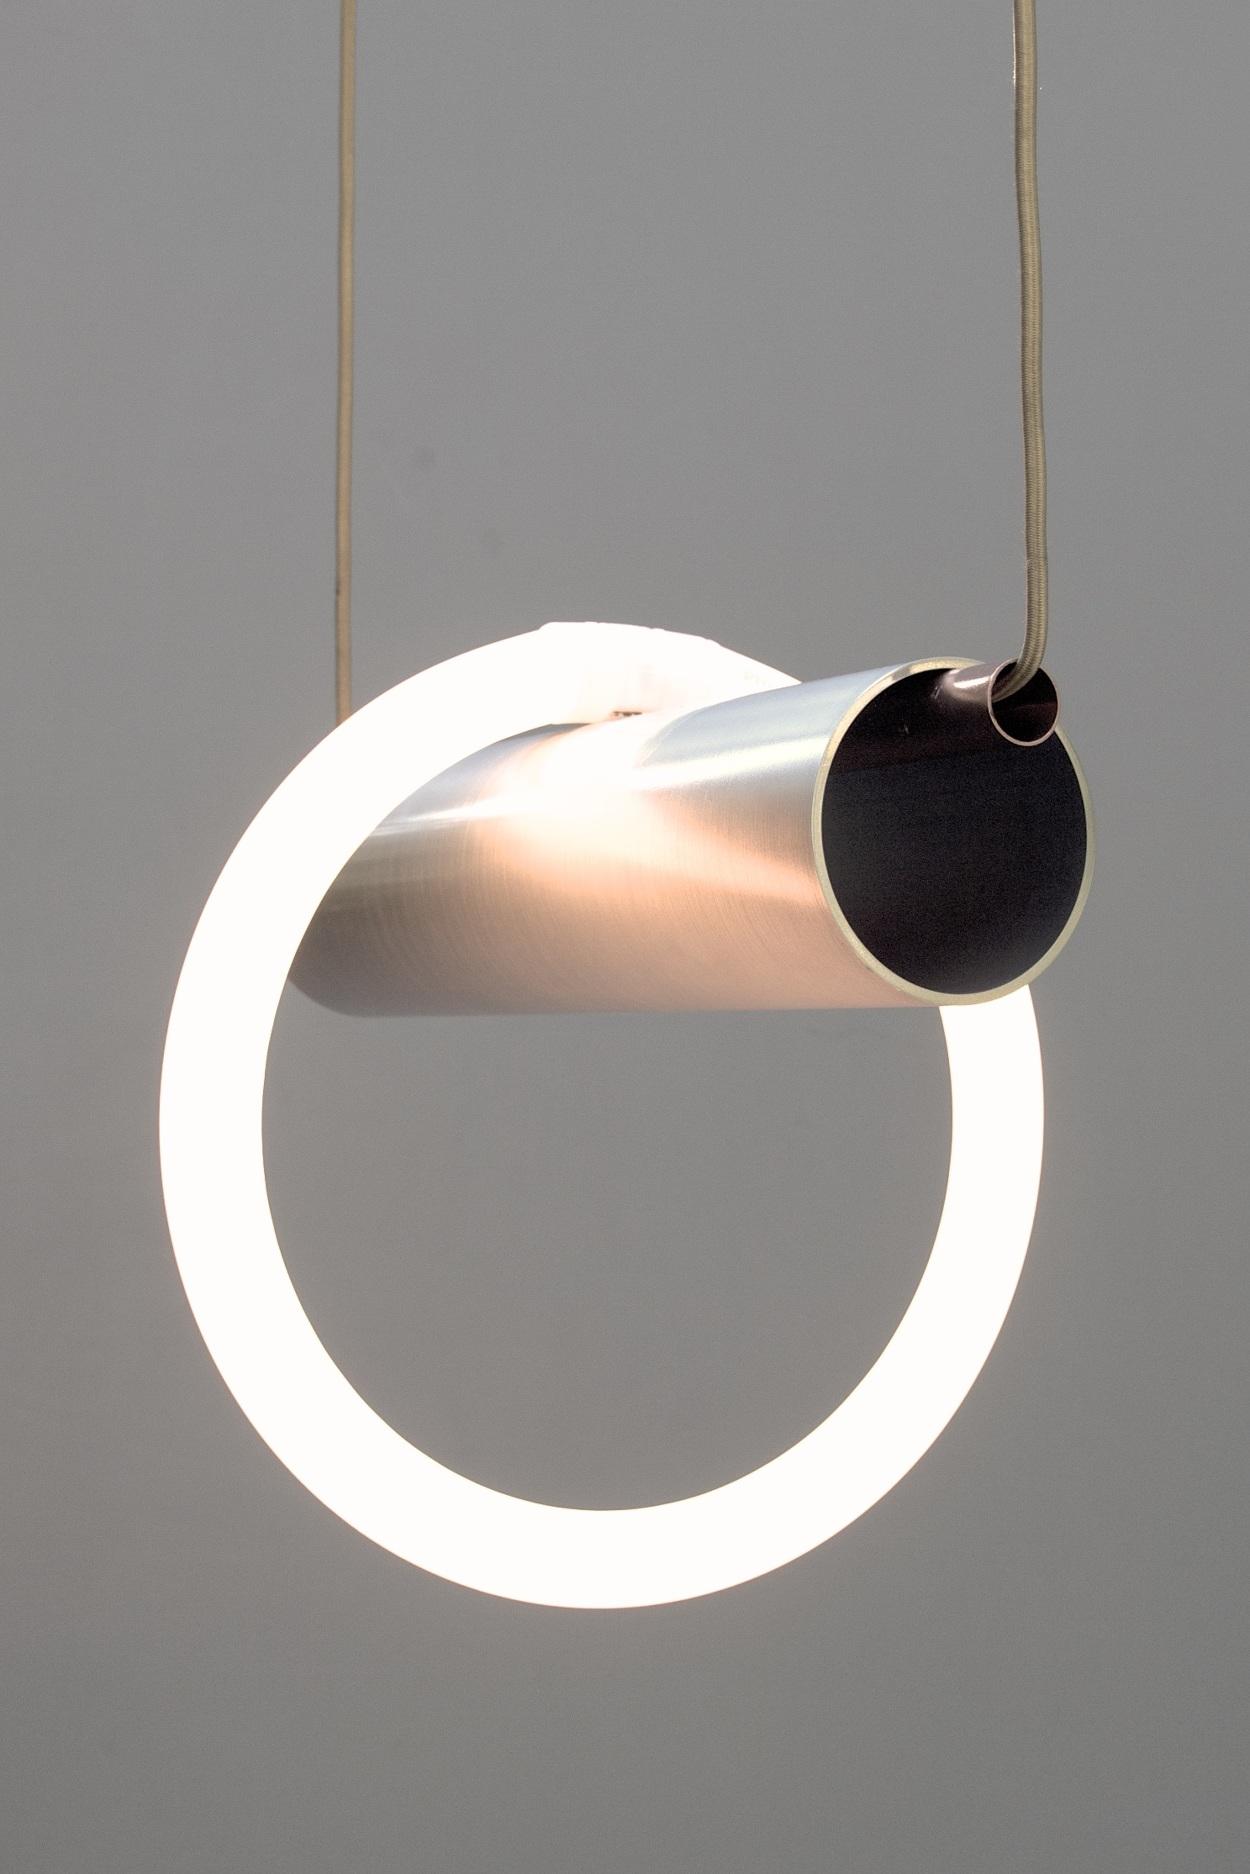 Hanging Composition 2011 Lukas Peet Design